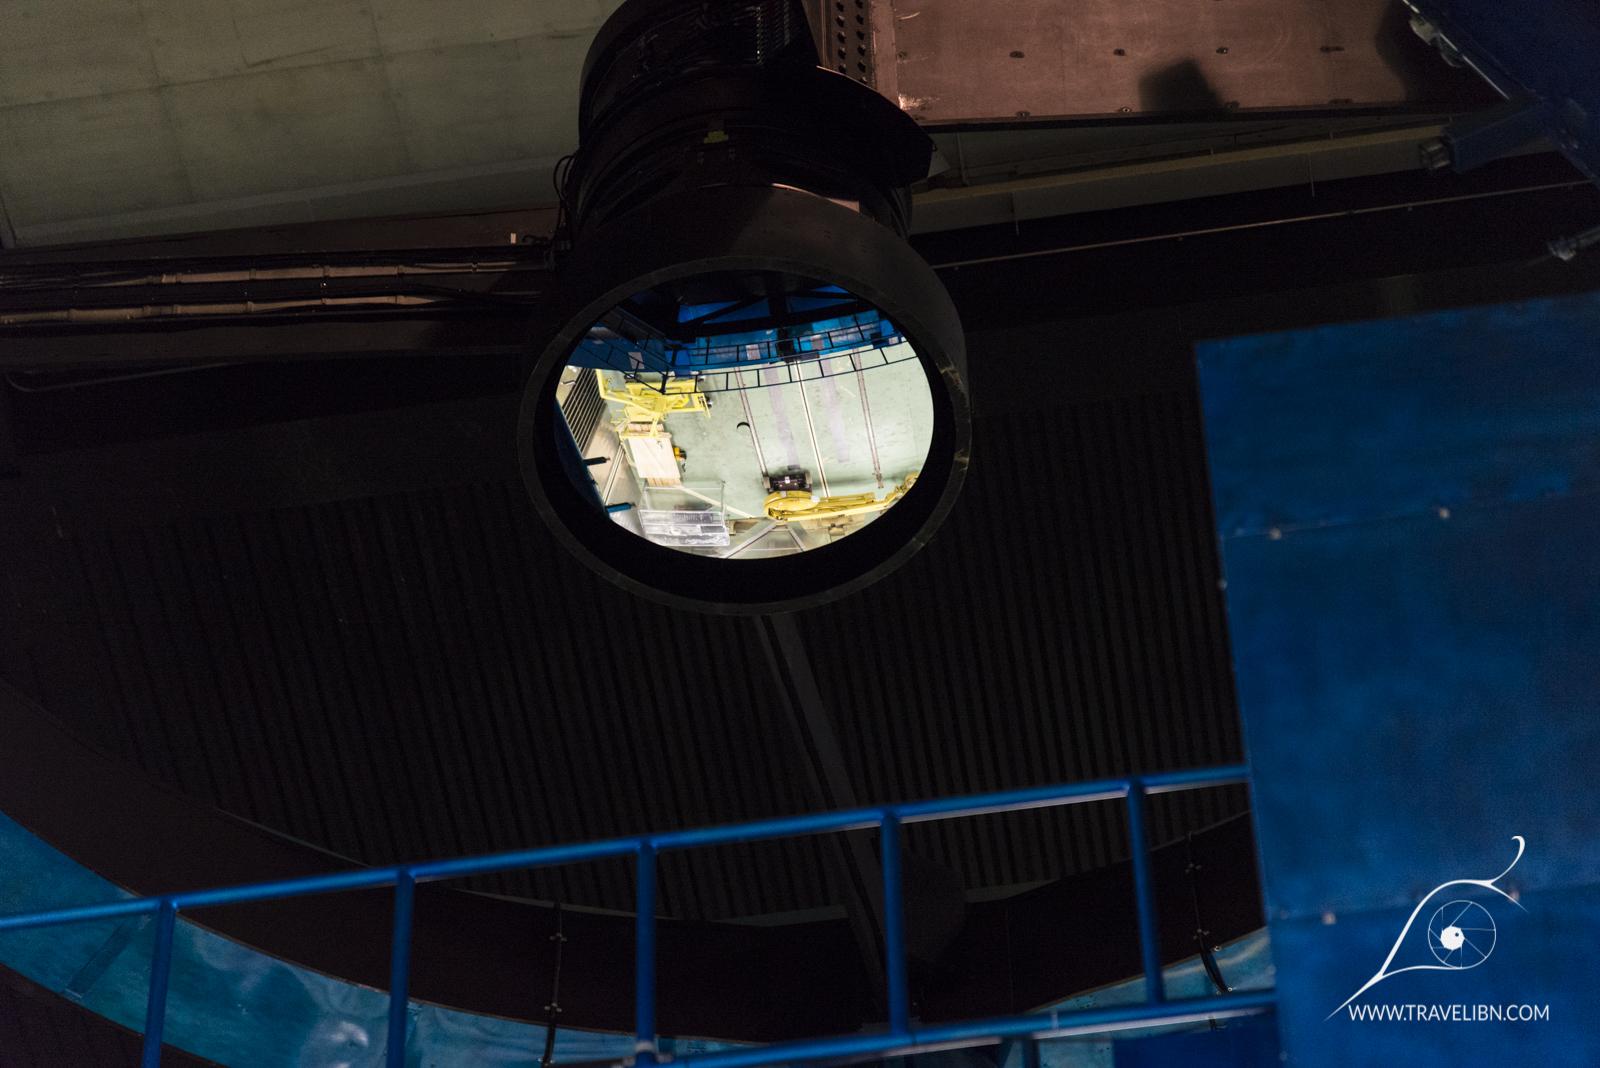 Secondary mirror